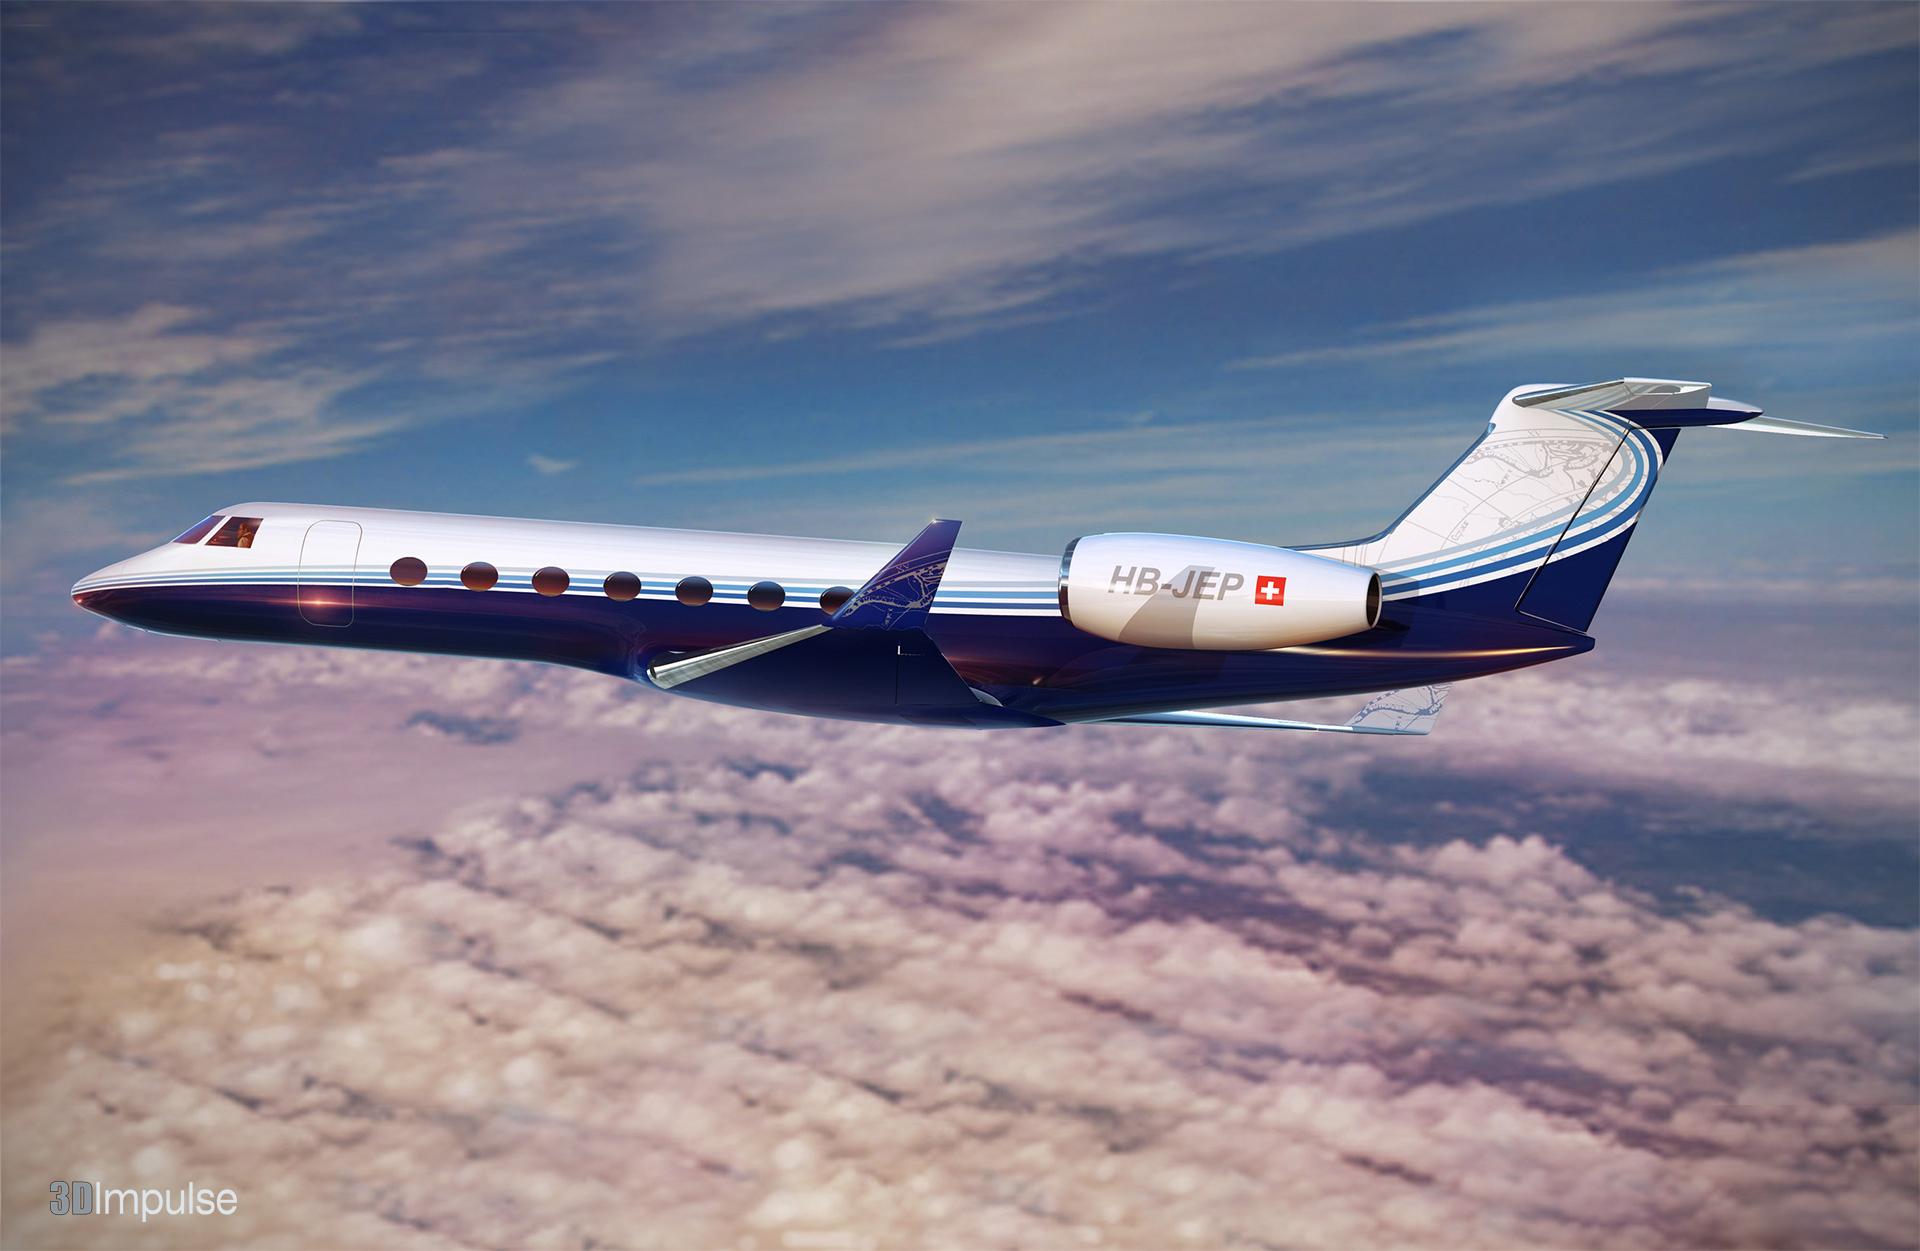 Gulfstream Exterior Paint Scheme  3d Impulse